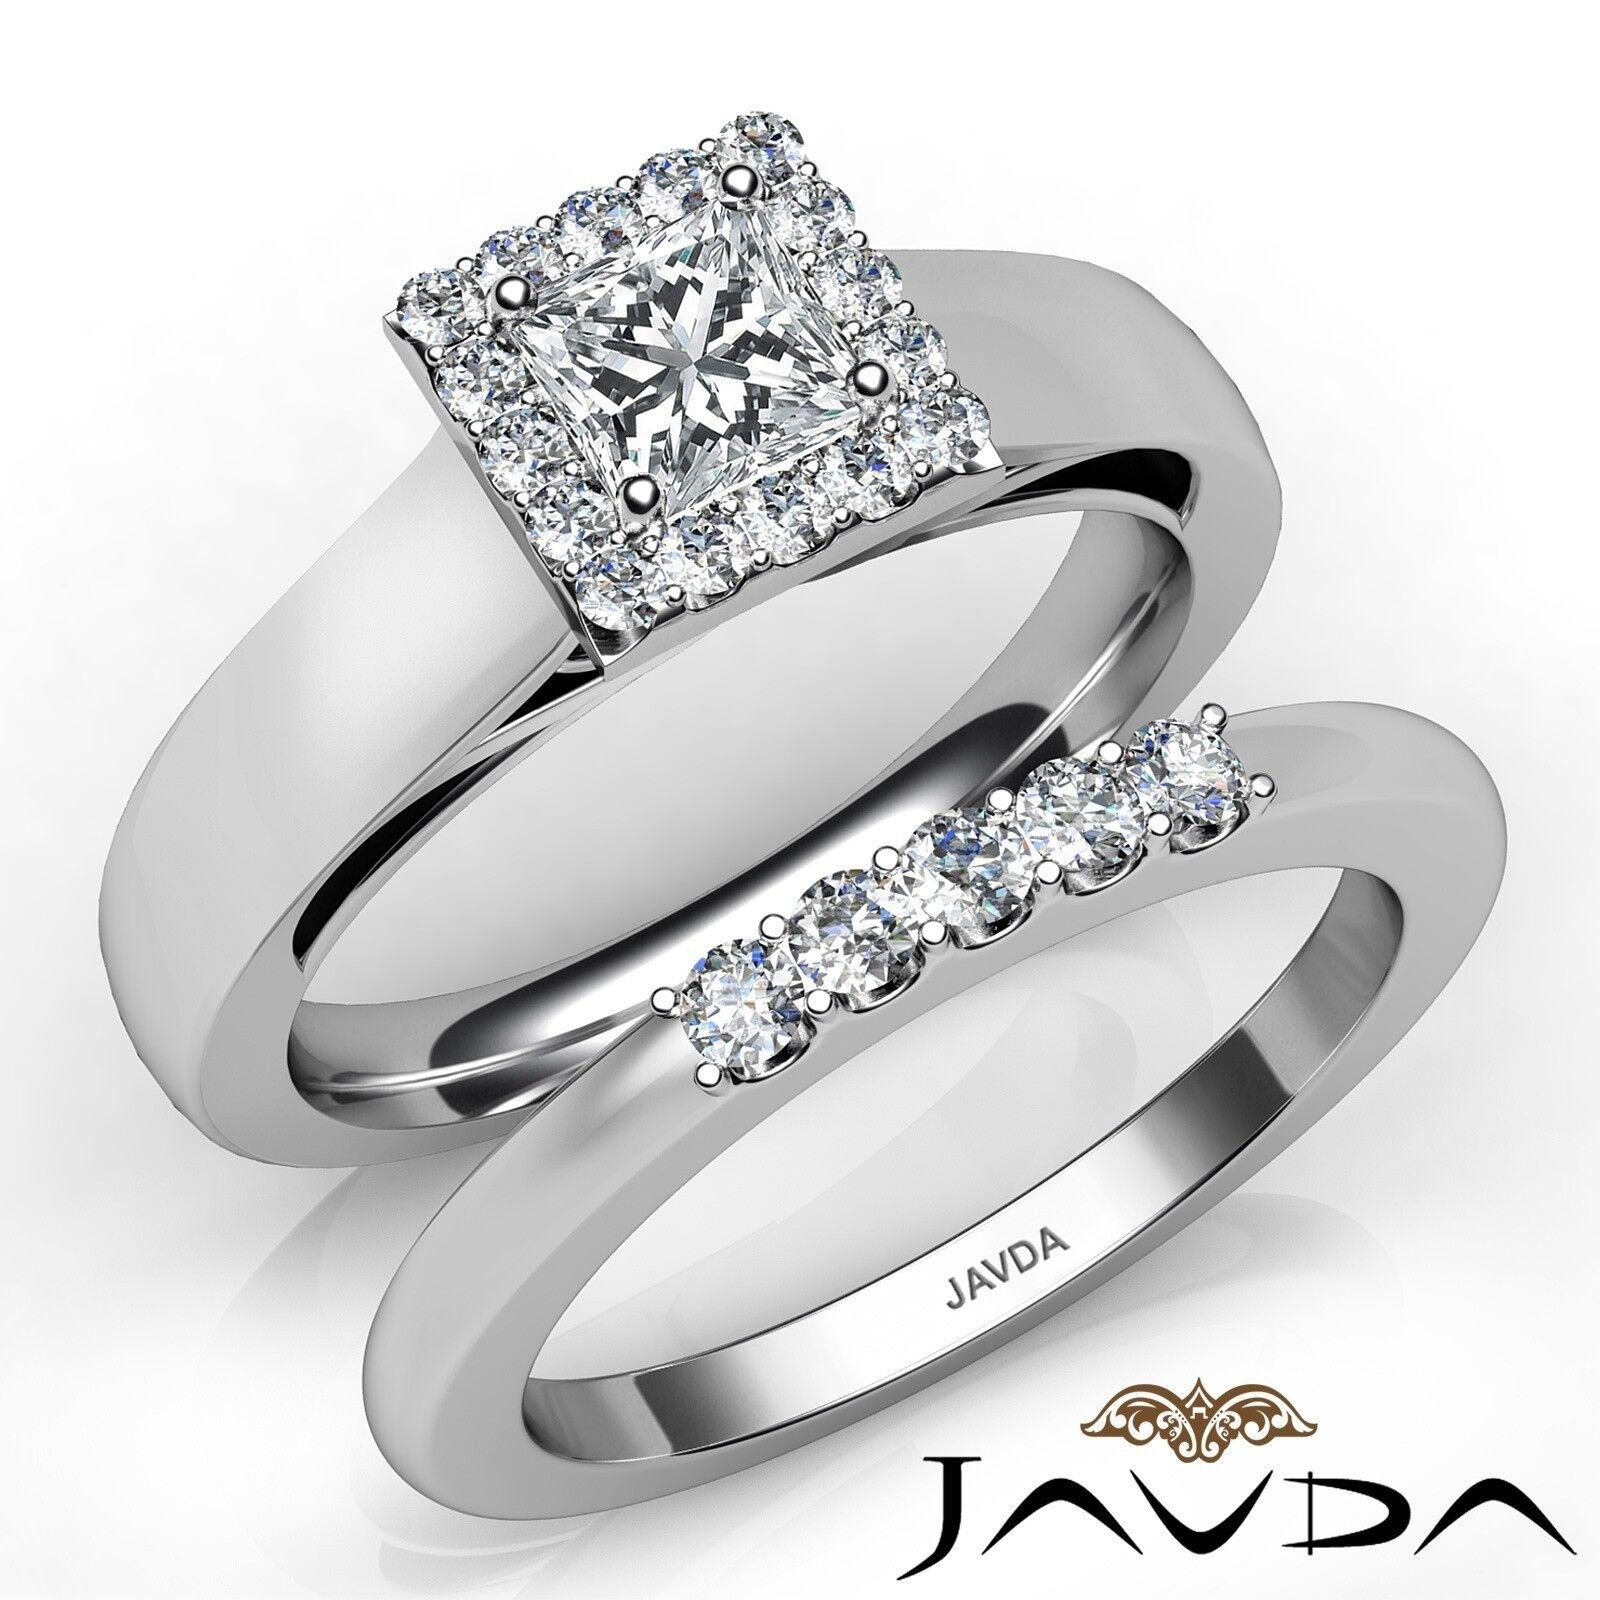 1.03ctw Halo Prong Bridal Set Princess Diamond Engagement Ring GIA E-SI1 Gold